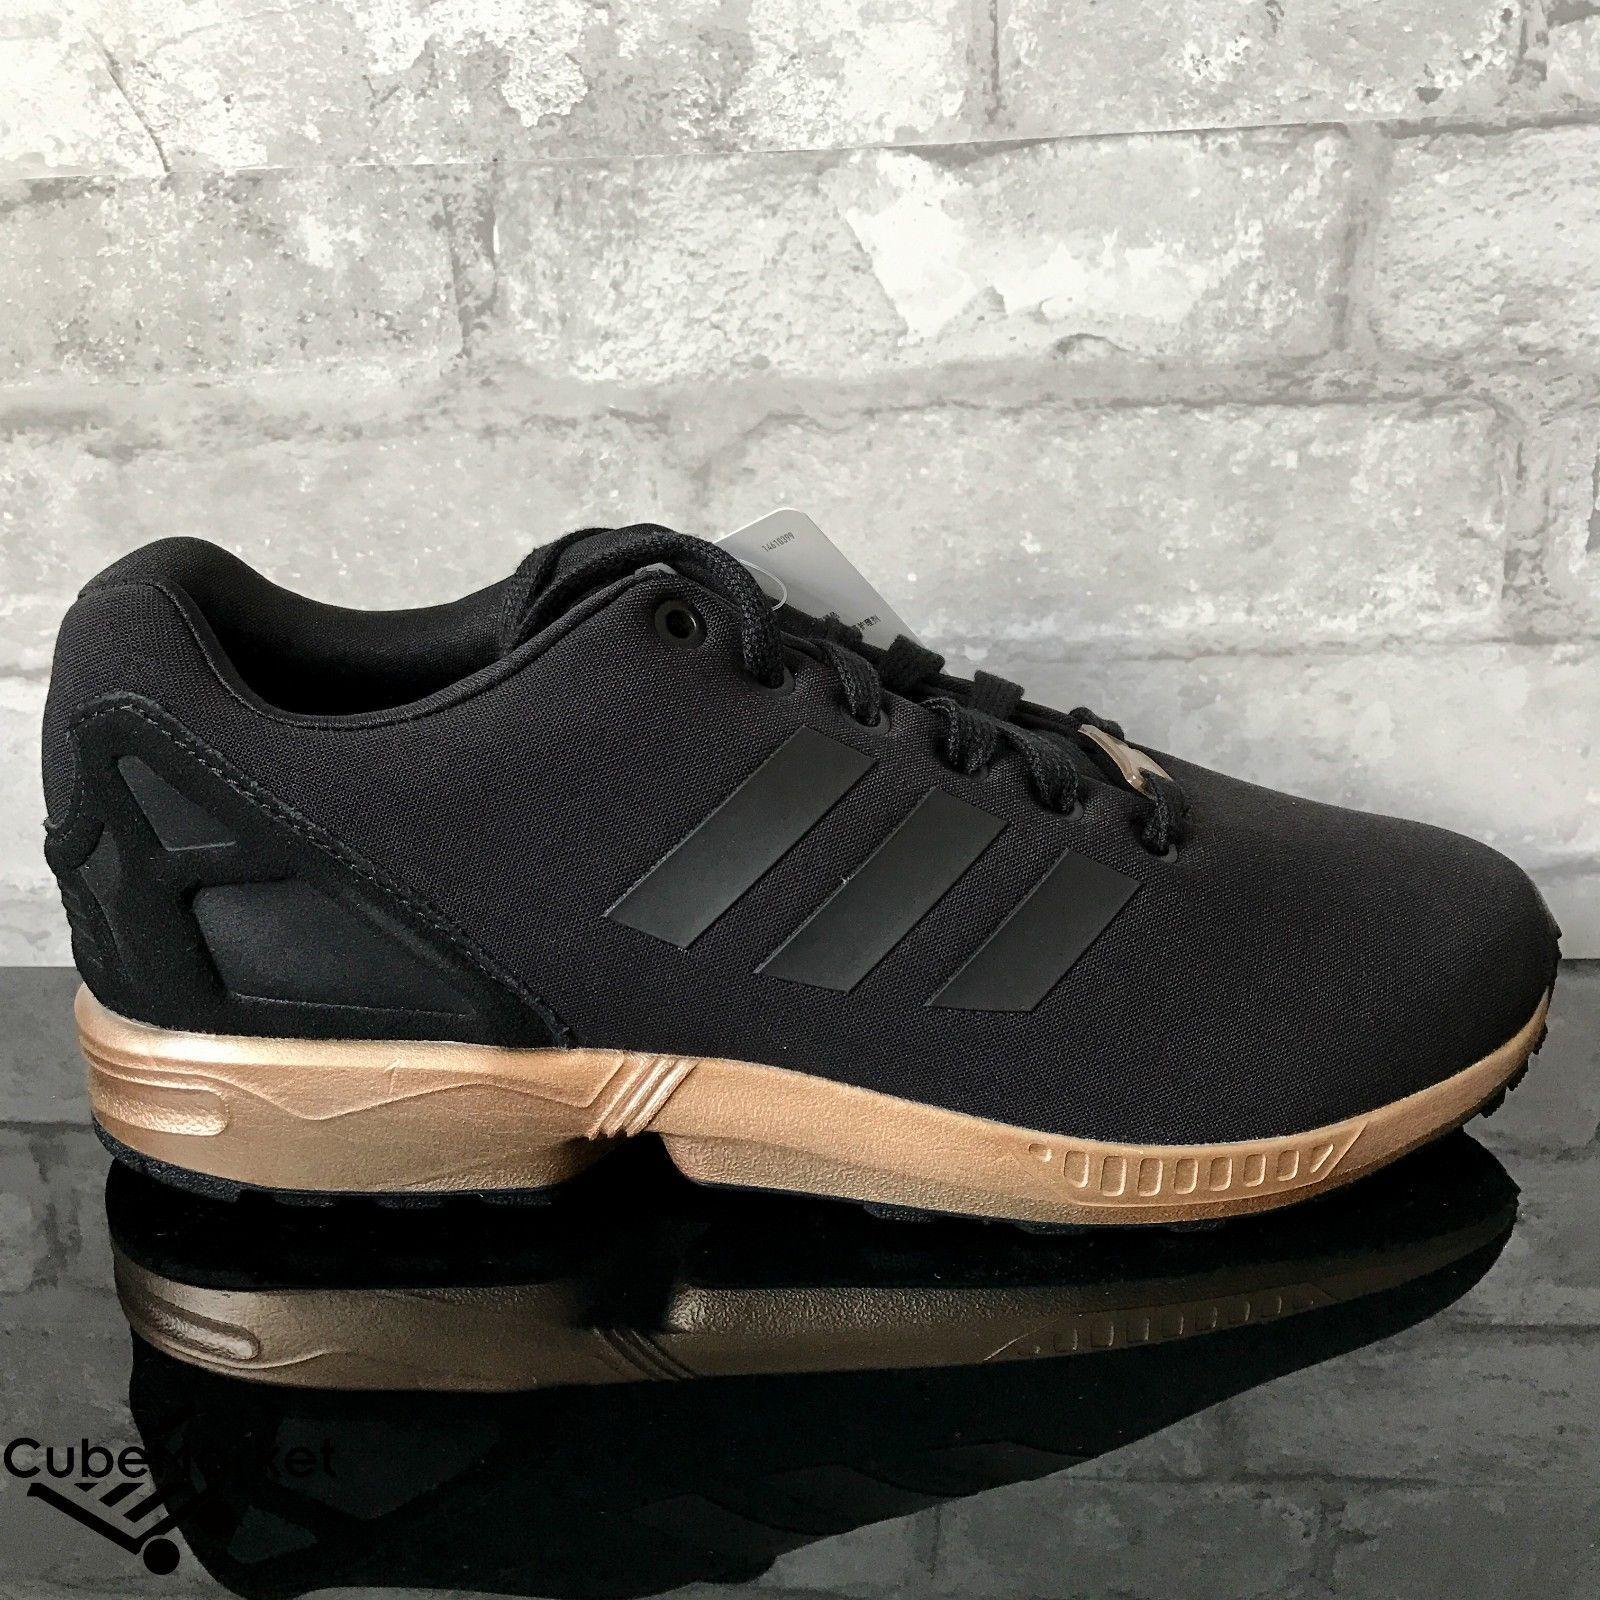 c0b4e0f1f Adidas ZX Flux W Black Copper Metallic Rose Gold S78977 Size 5-11 ...